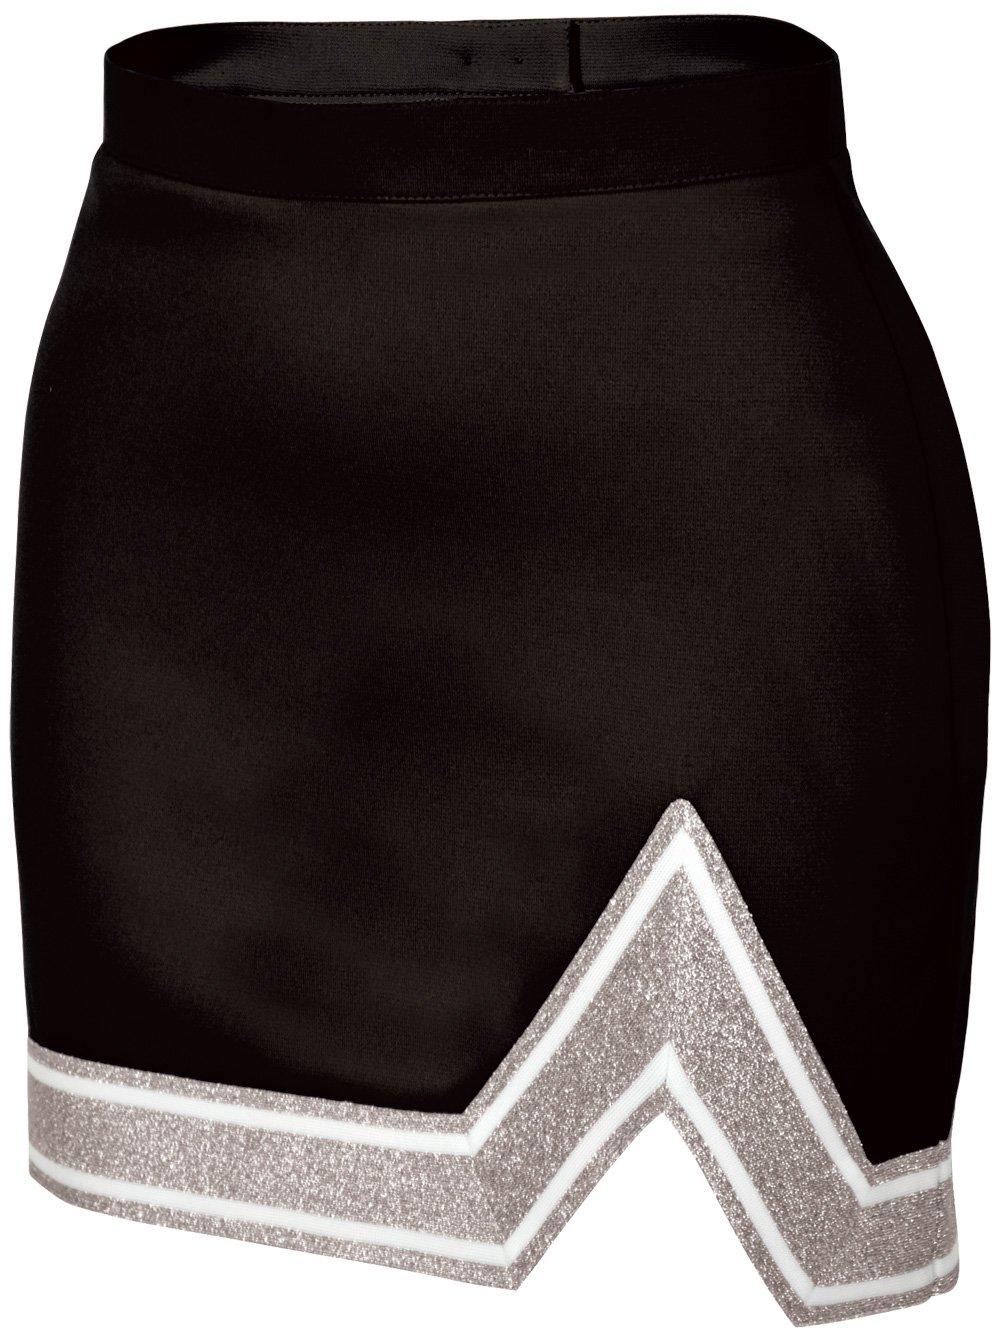 Chassé Womens' Blaze Skirt Black/White/Metallic Silver Adult X-Small